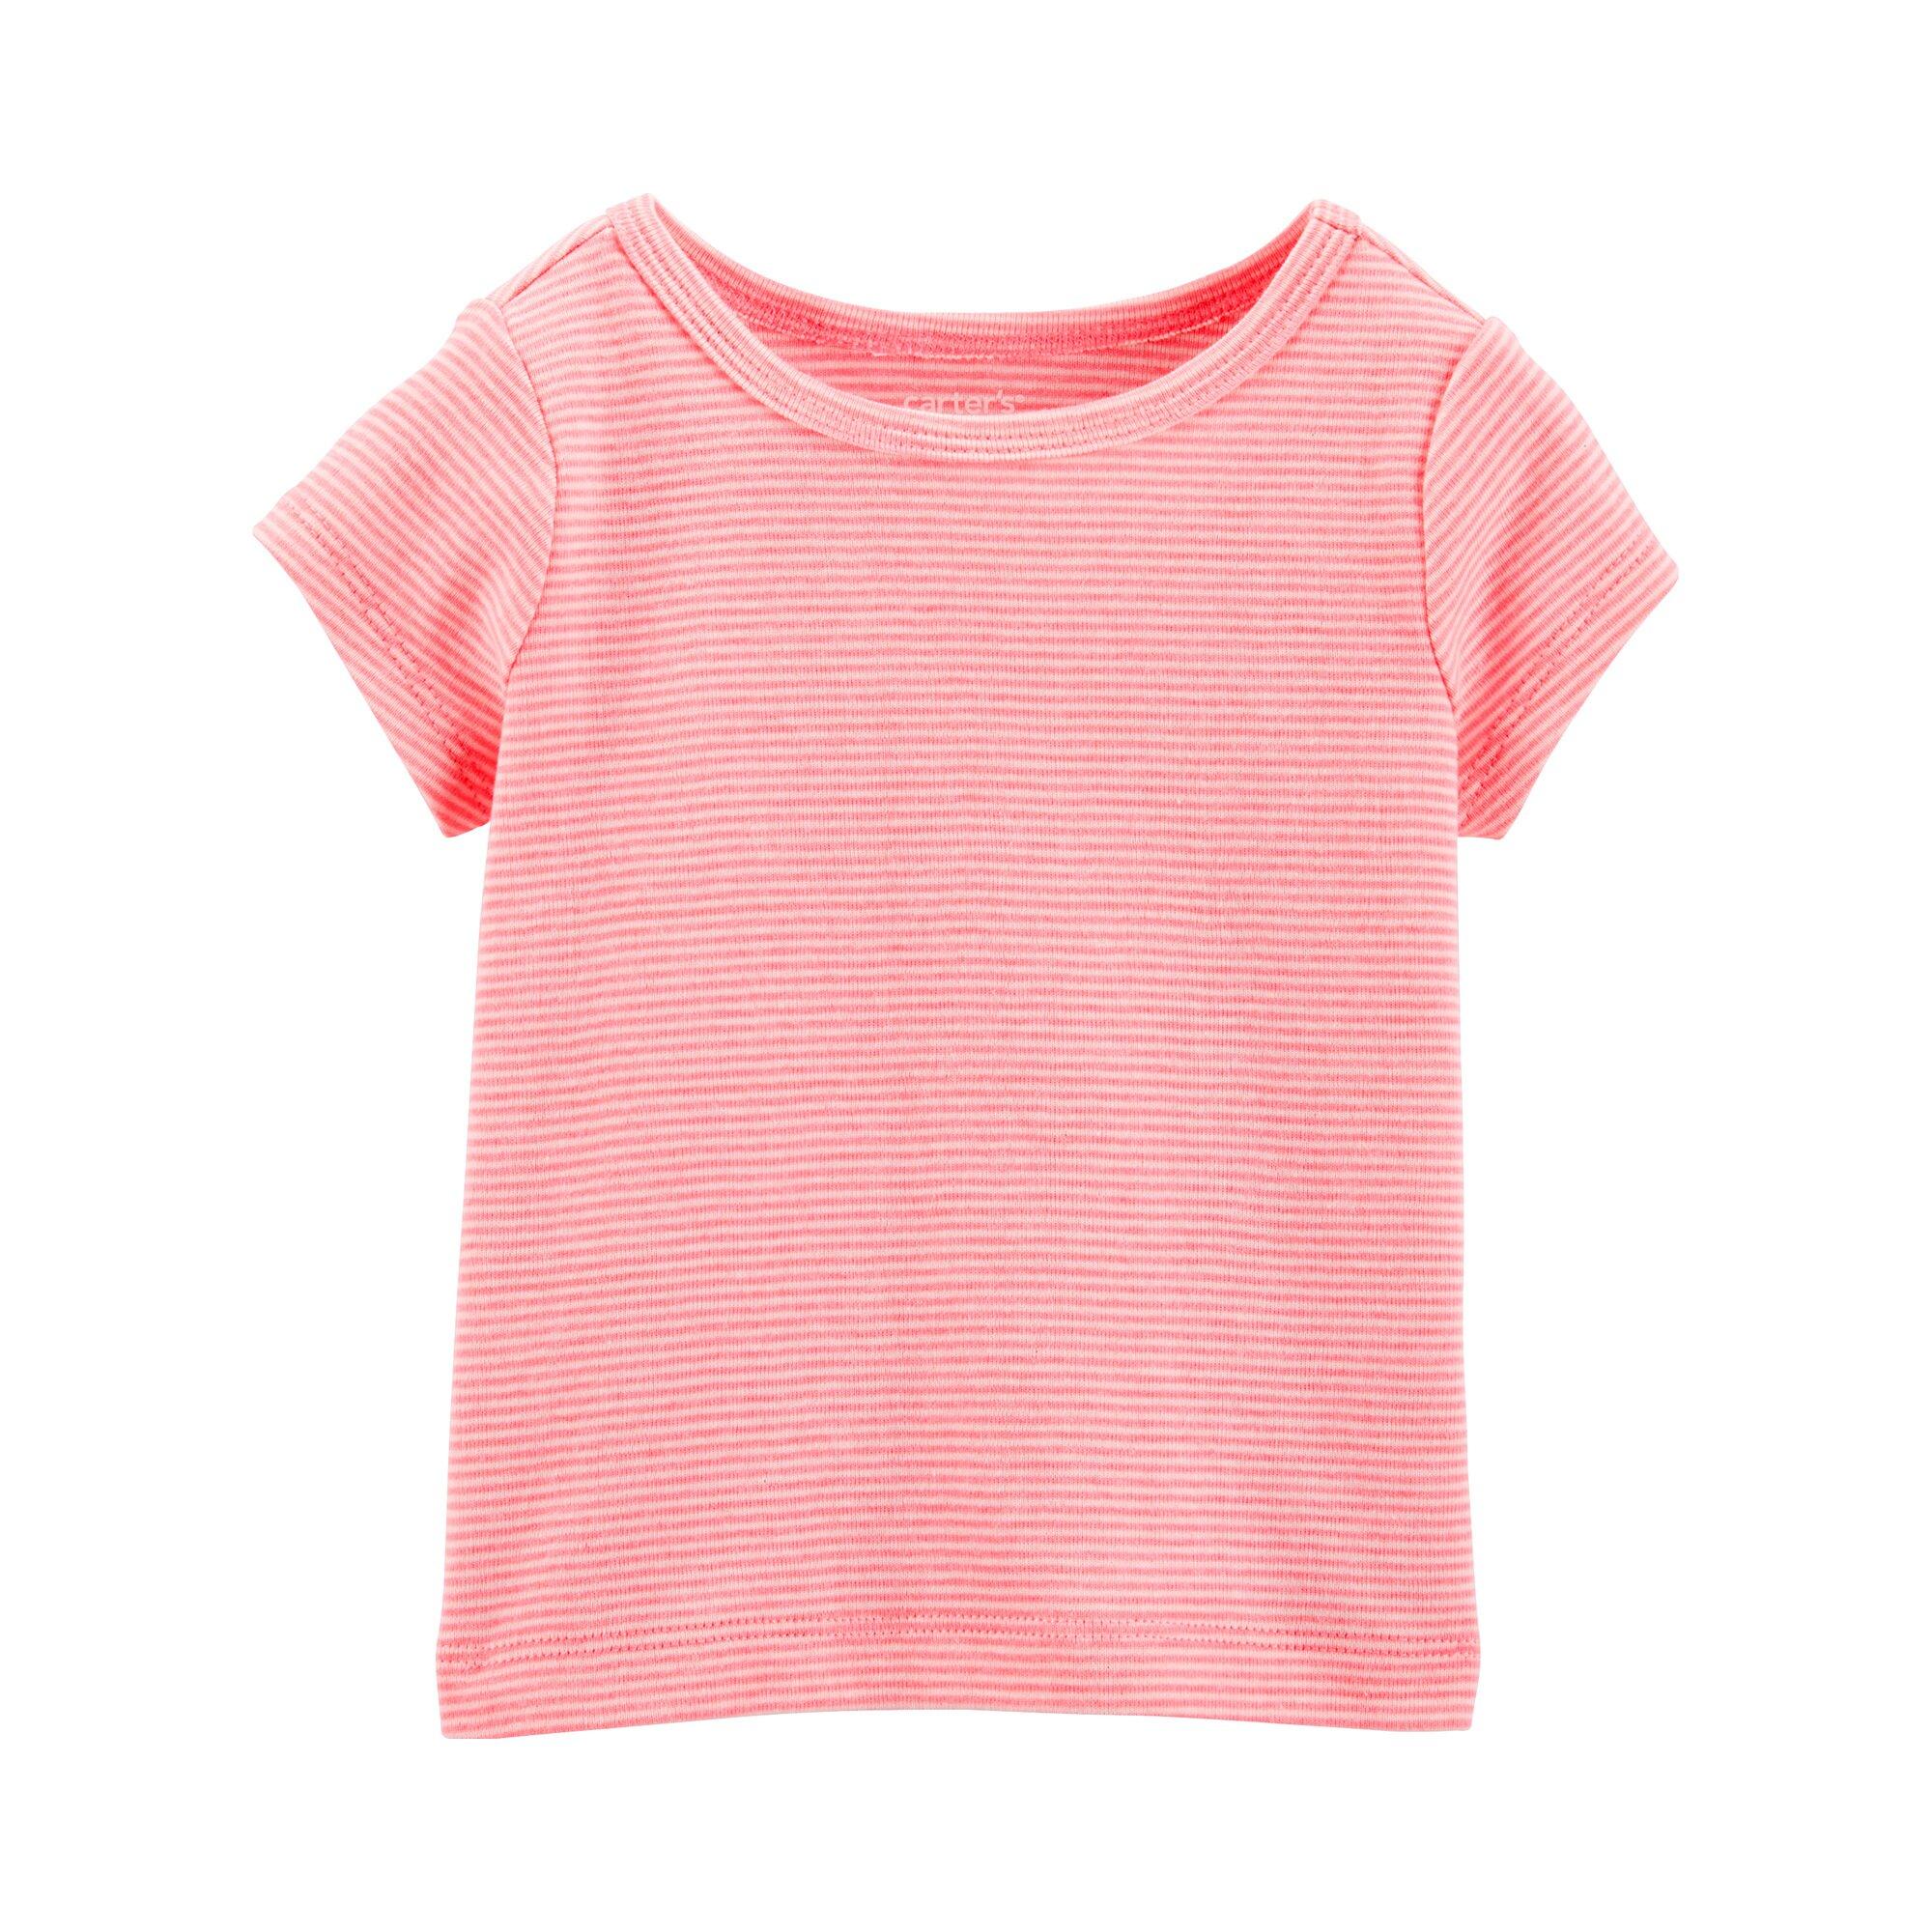 carter-s-2-tlg-set-latzhose-und-t-shirt-herzen